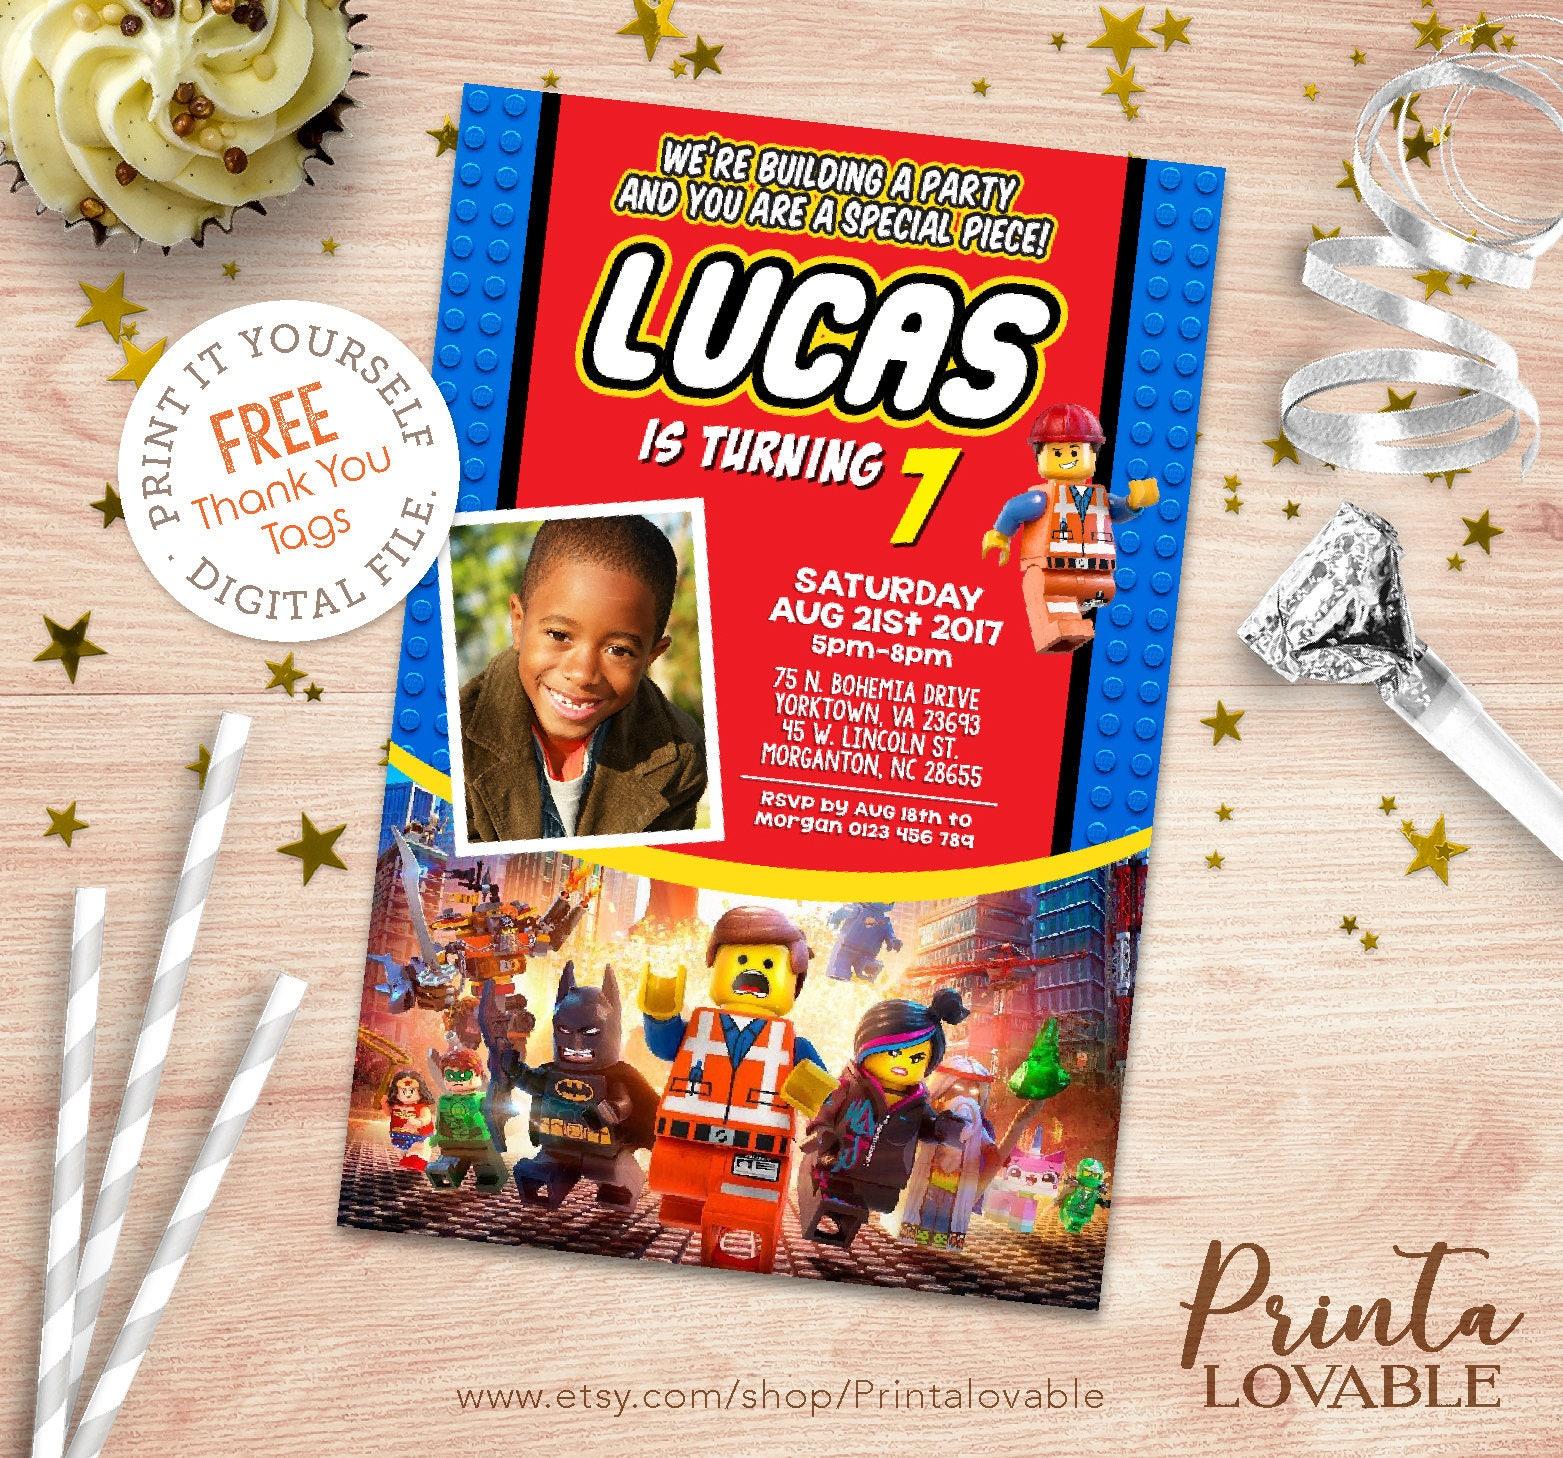 Digital Lego Movie invitation. FREE Lego Movie thank you